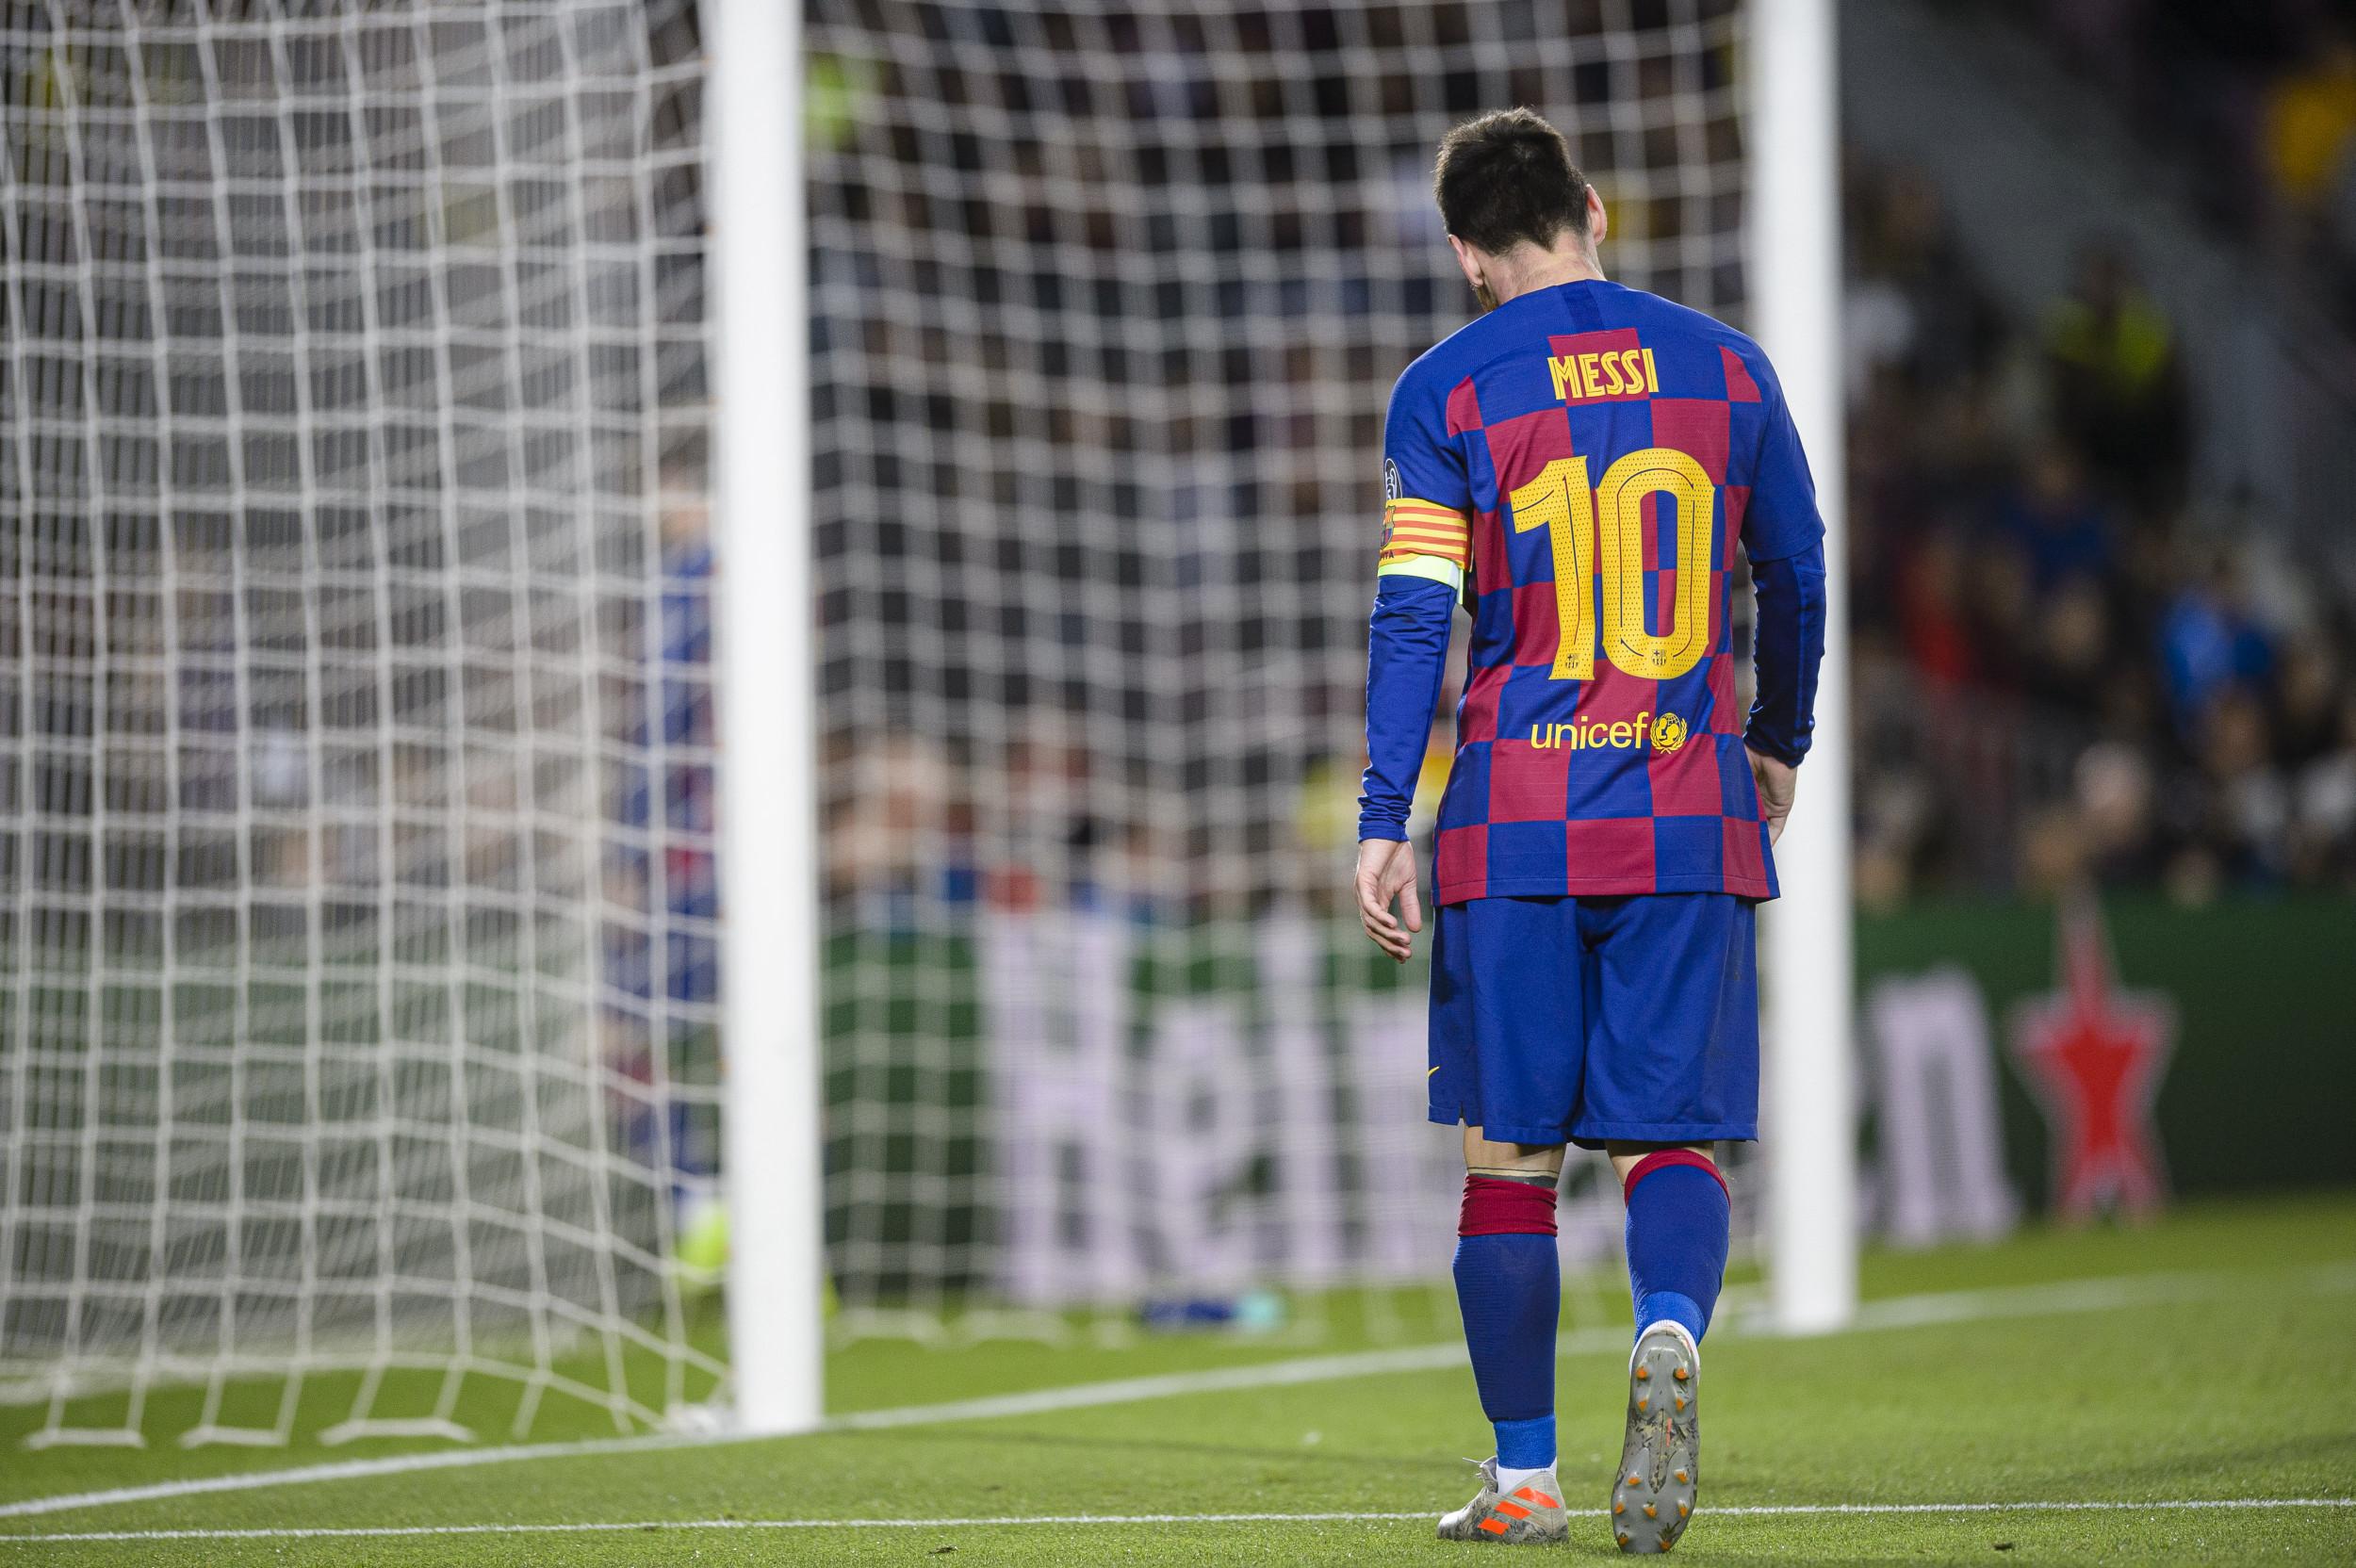 Barcelona vs. Celta Vigo: Where to watch La Liga this weekend